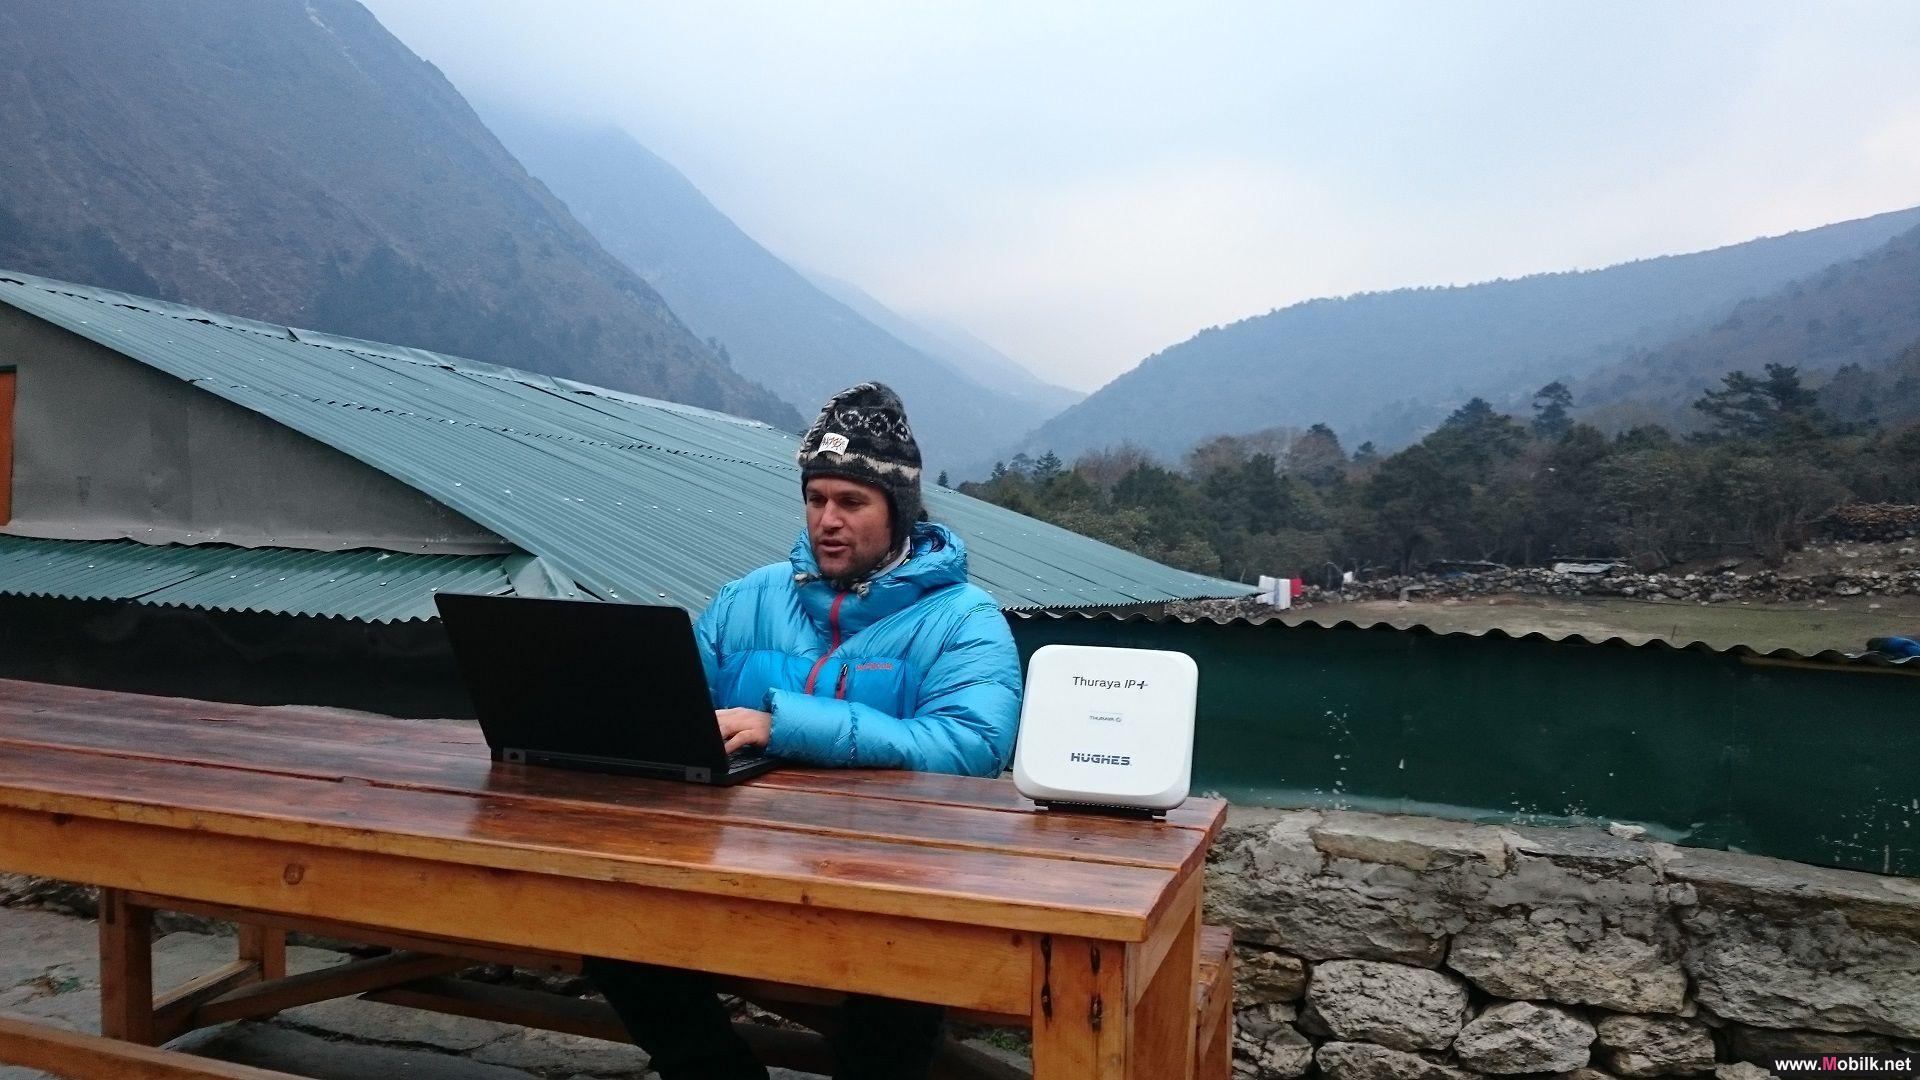 Thuraya Keeps Mt. Everest Climbers Connected on Summit Journey